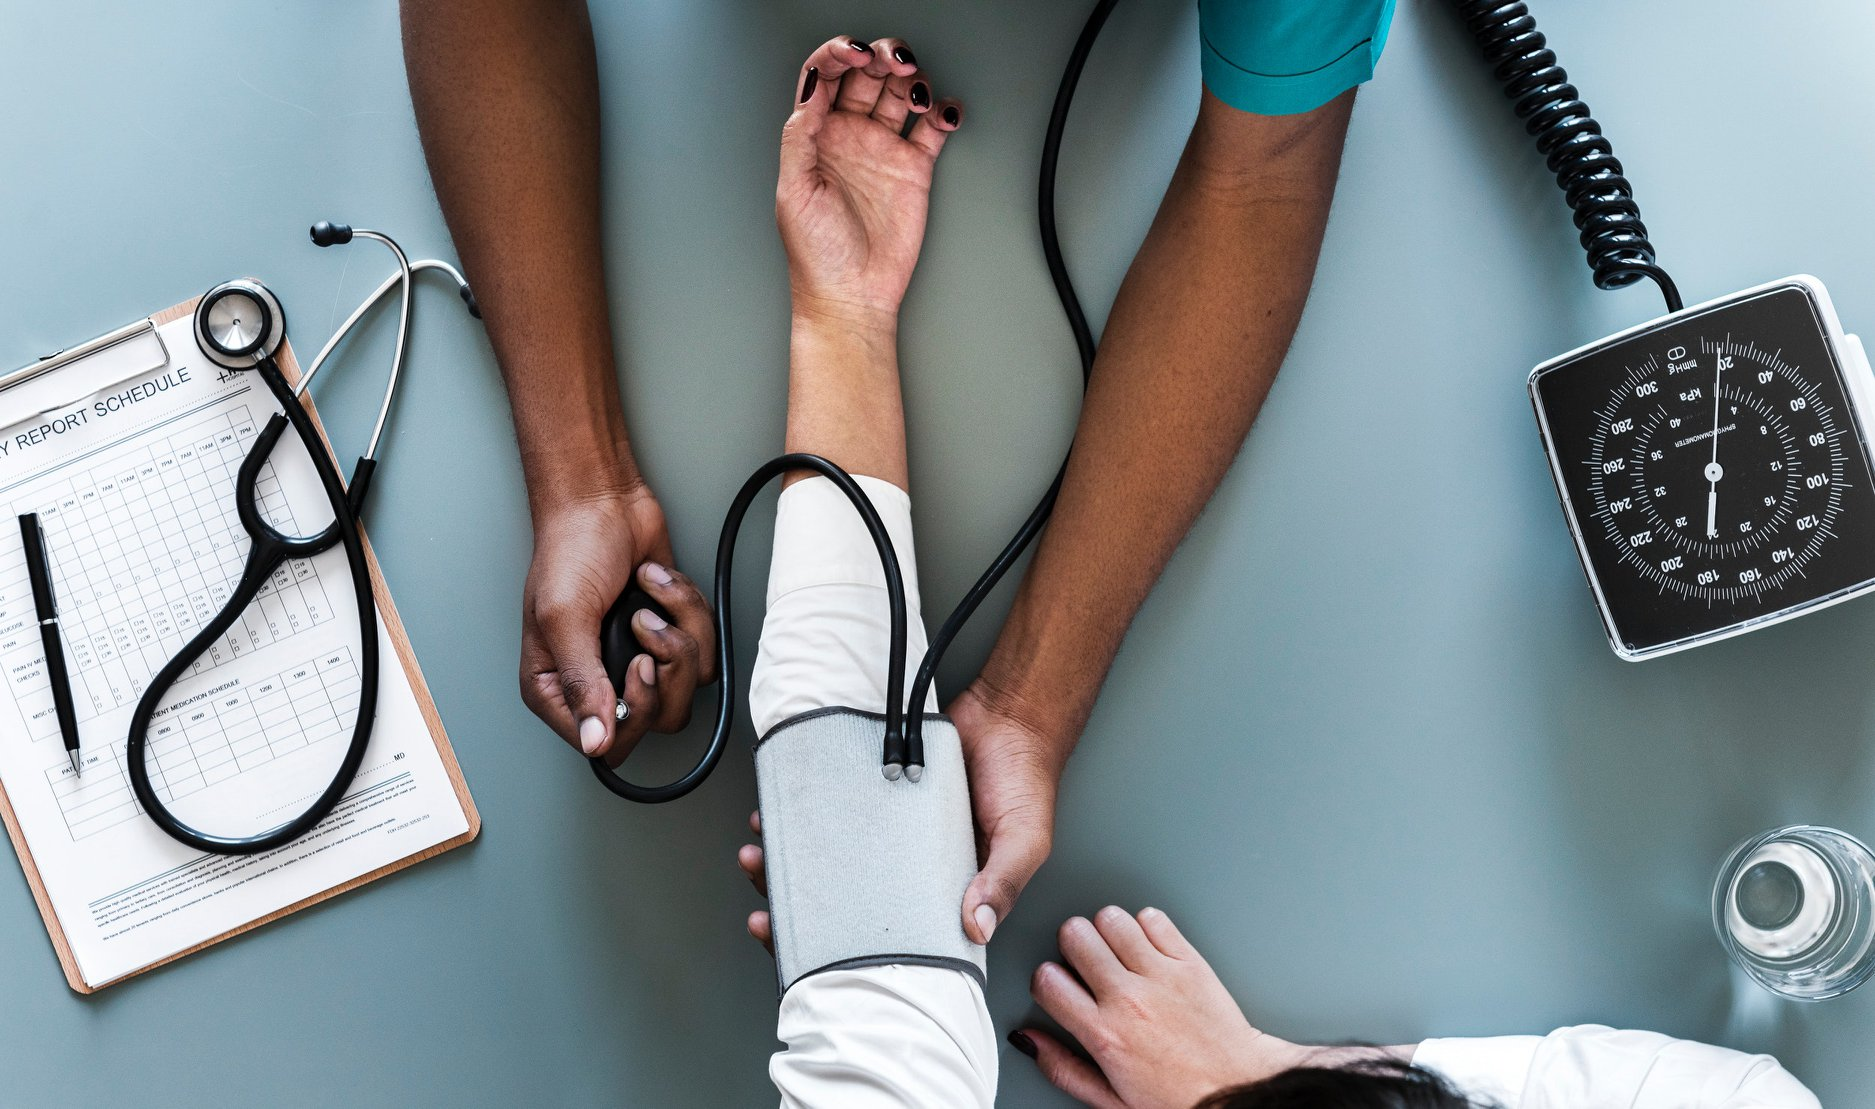 Connectus Health Stock Image.jpg